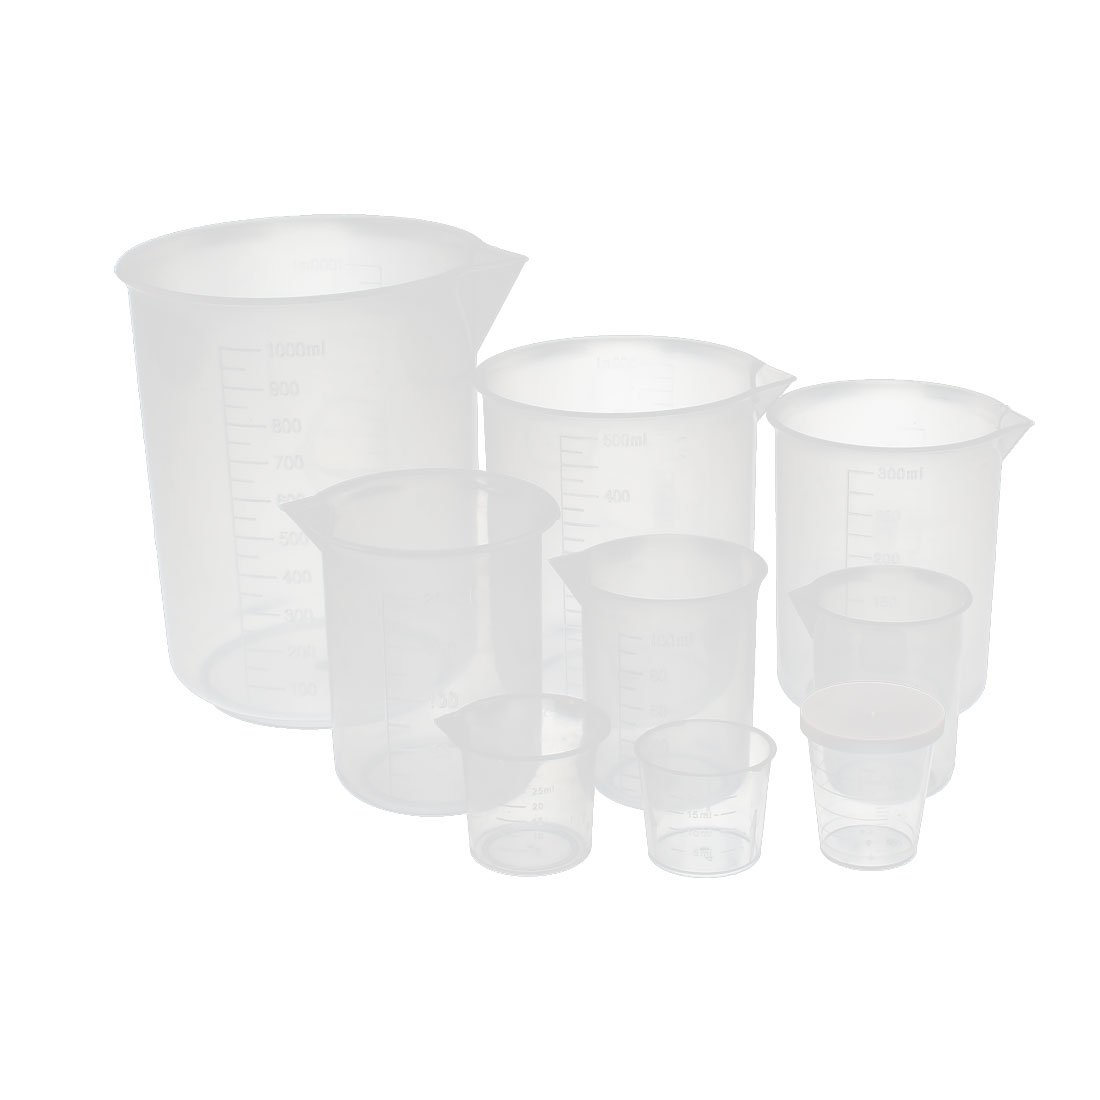 uxcell Set 20-1000mL School Laboratory Transparent Plastic Liquid Container Measuring Cup Beaker